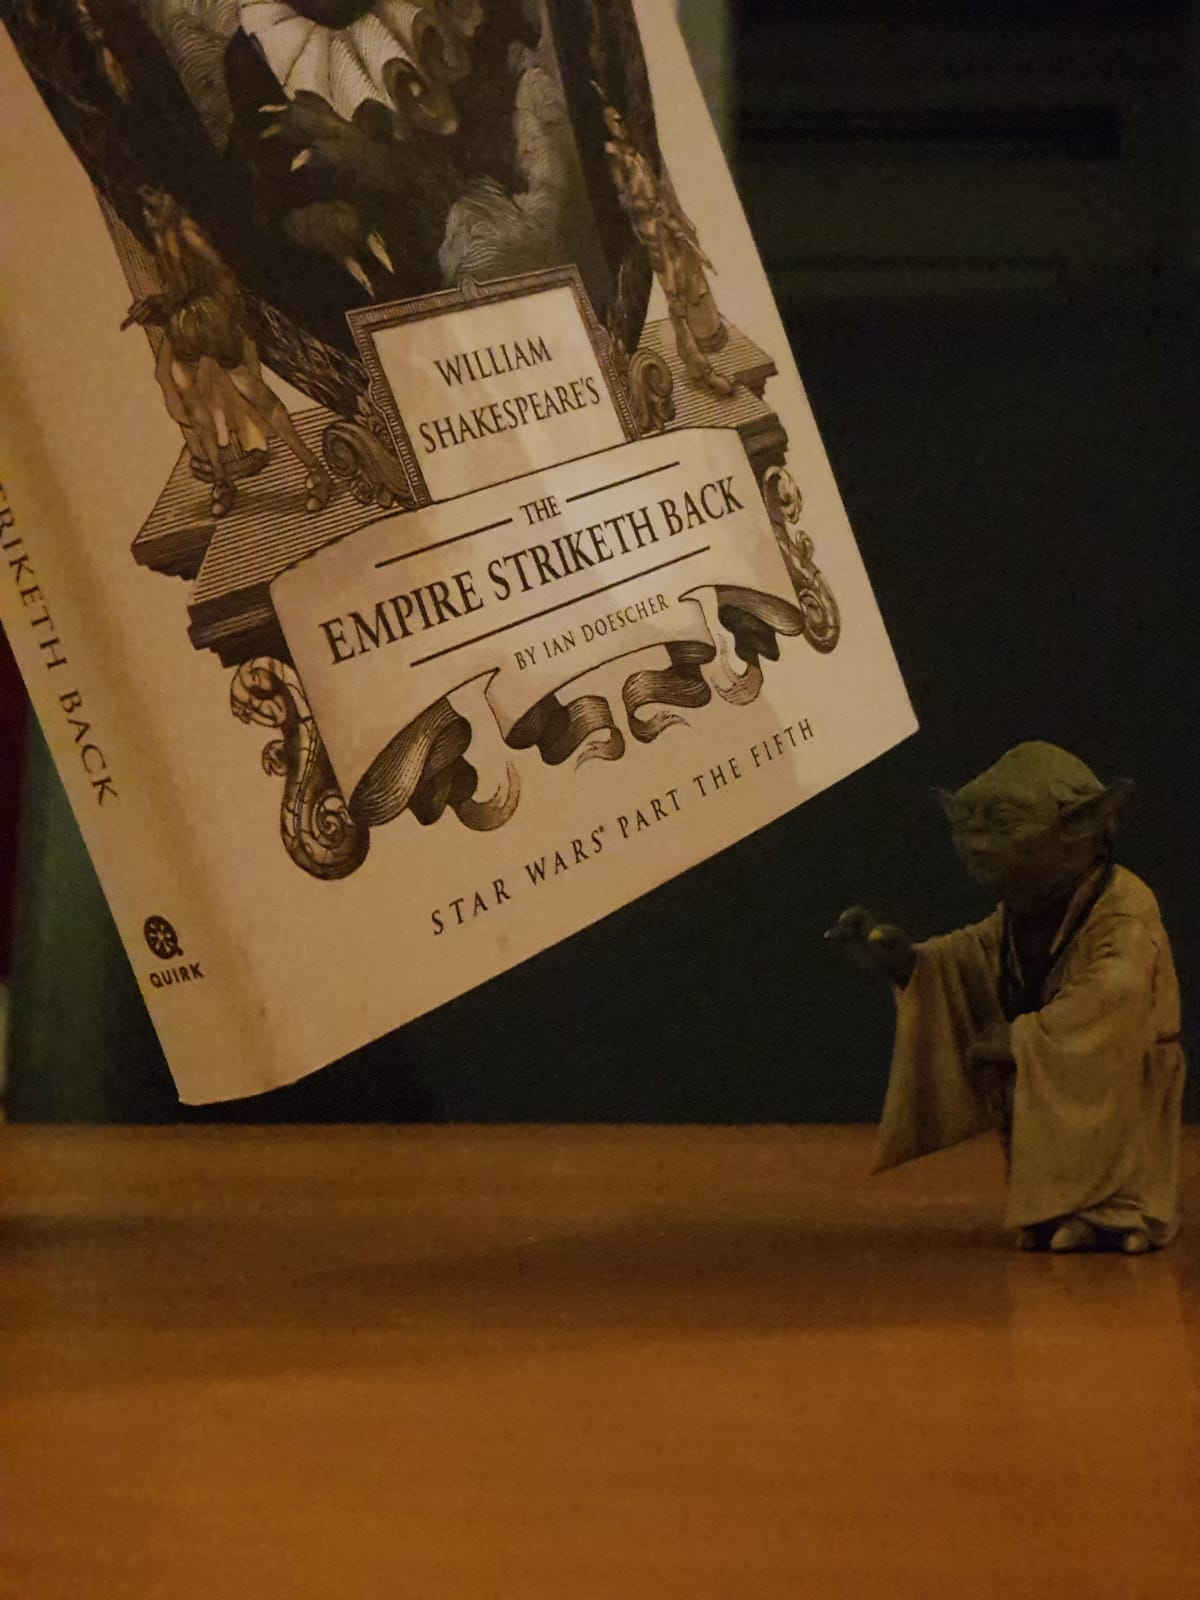 The Empire Striketh Back